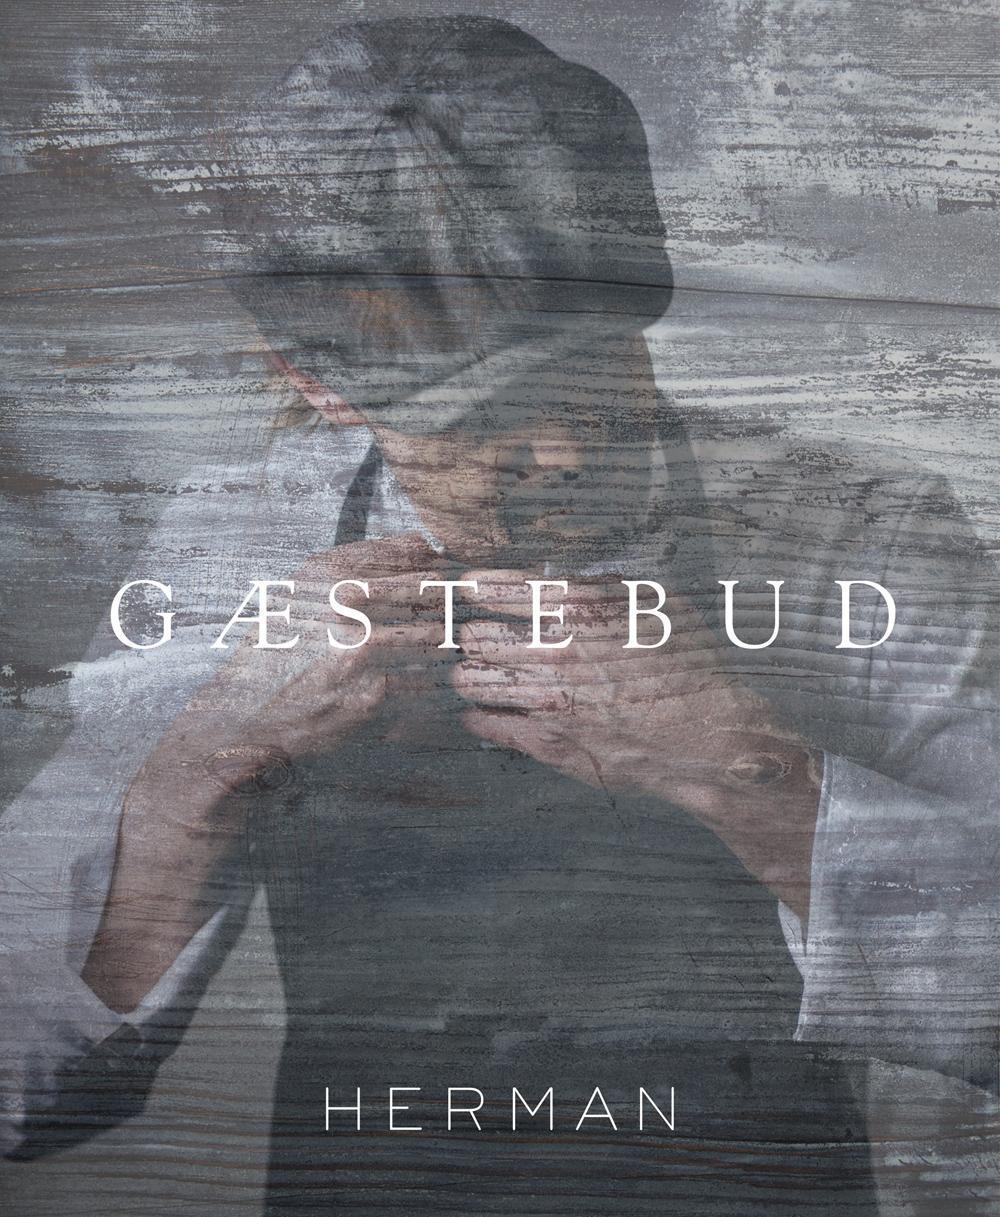 Gæstebud - Thomas Herman - Bøger - Politikens Forlag - 9788740013900 - September 15, 2016